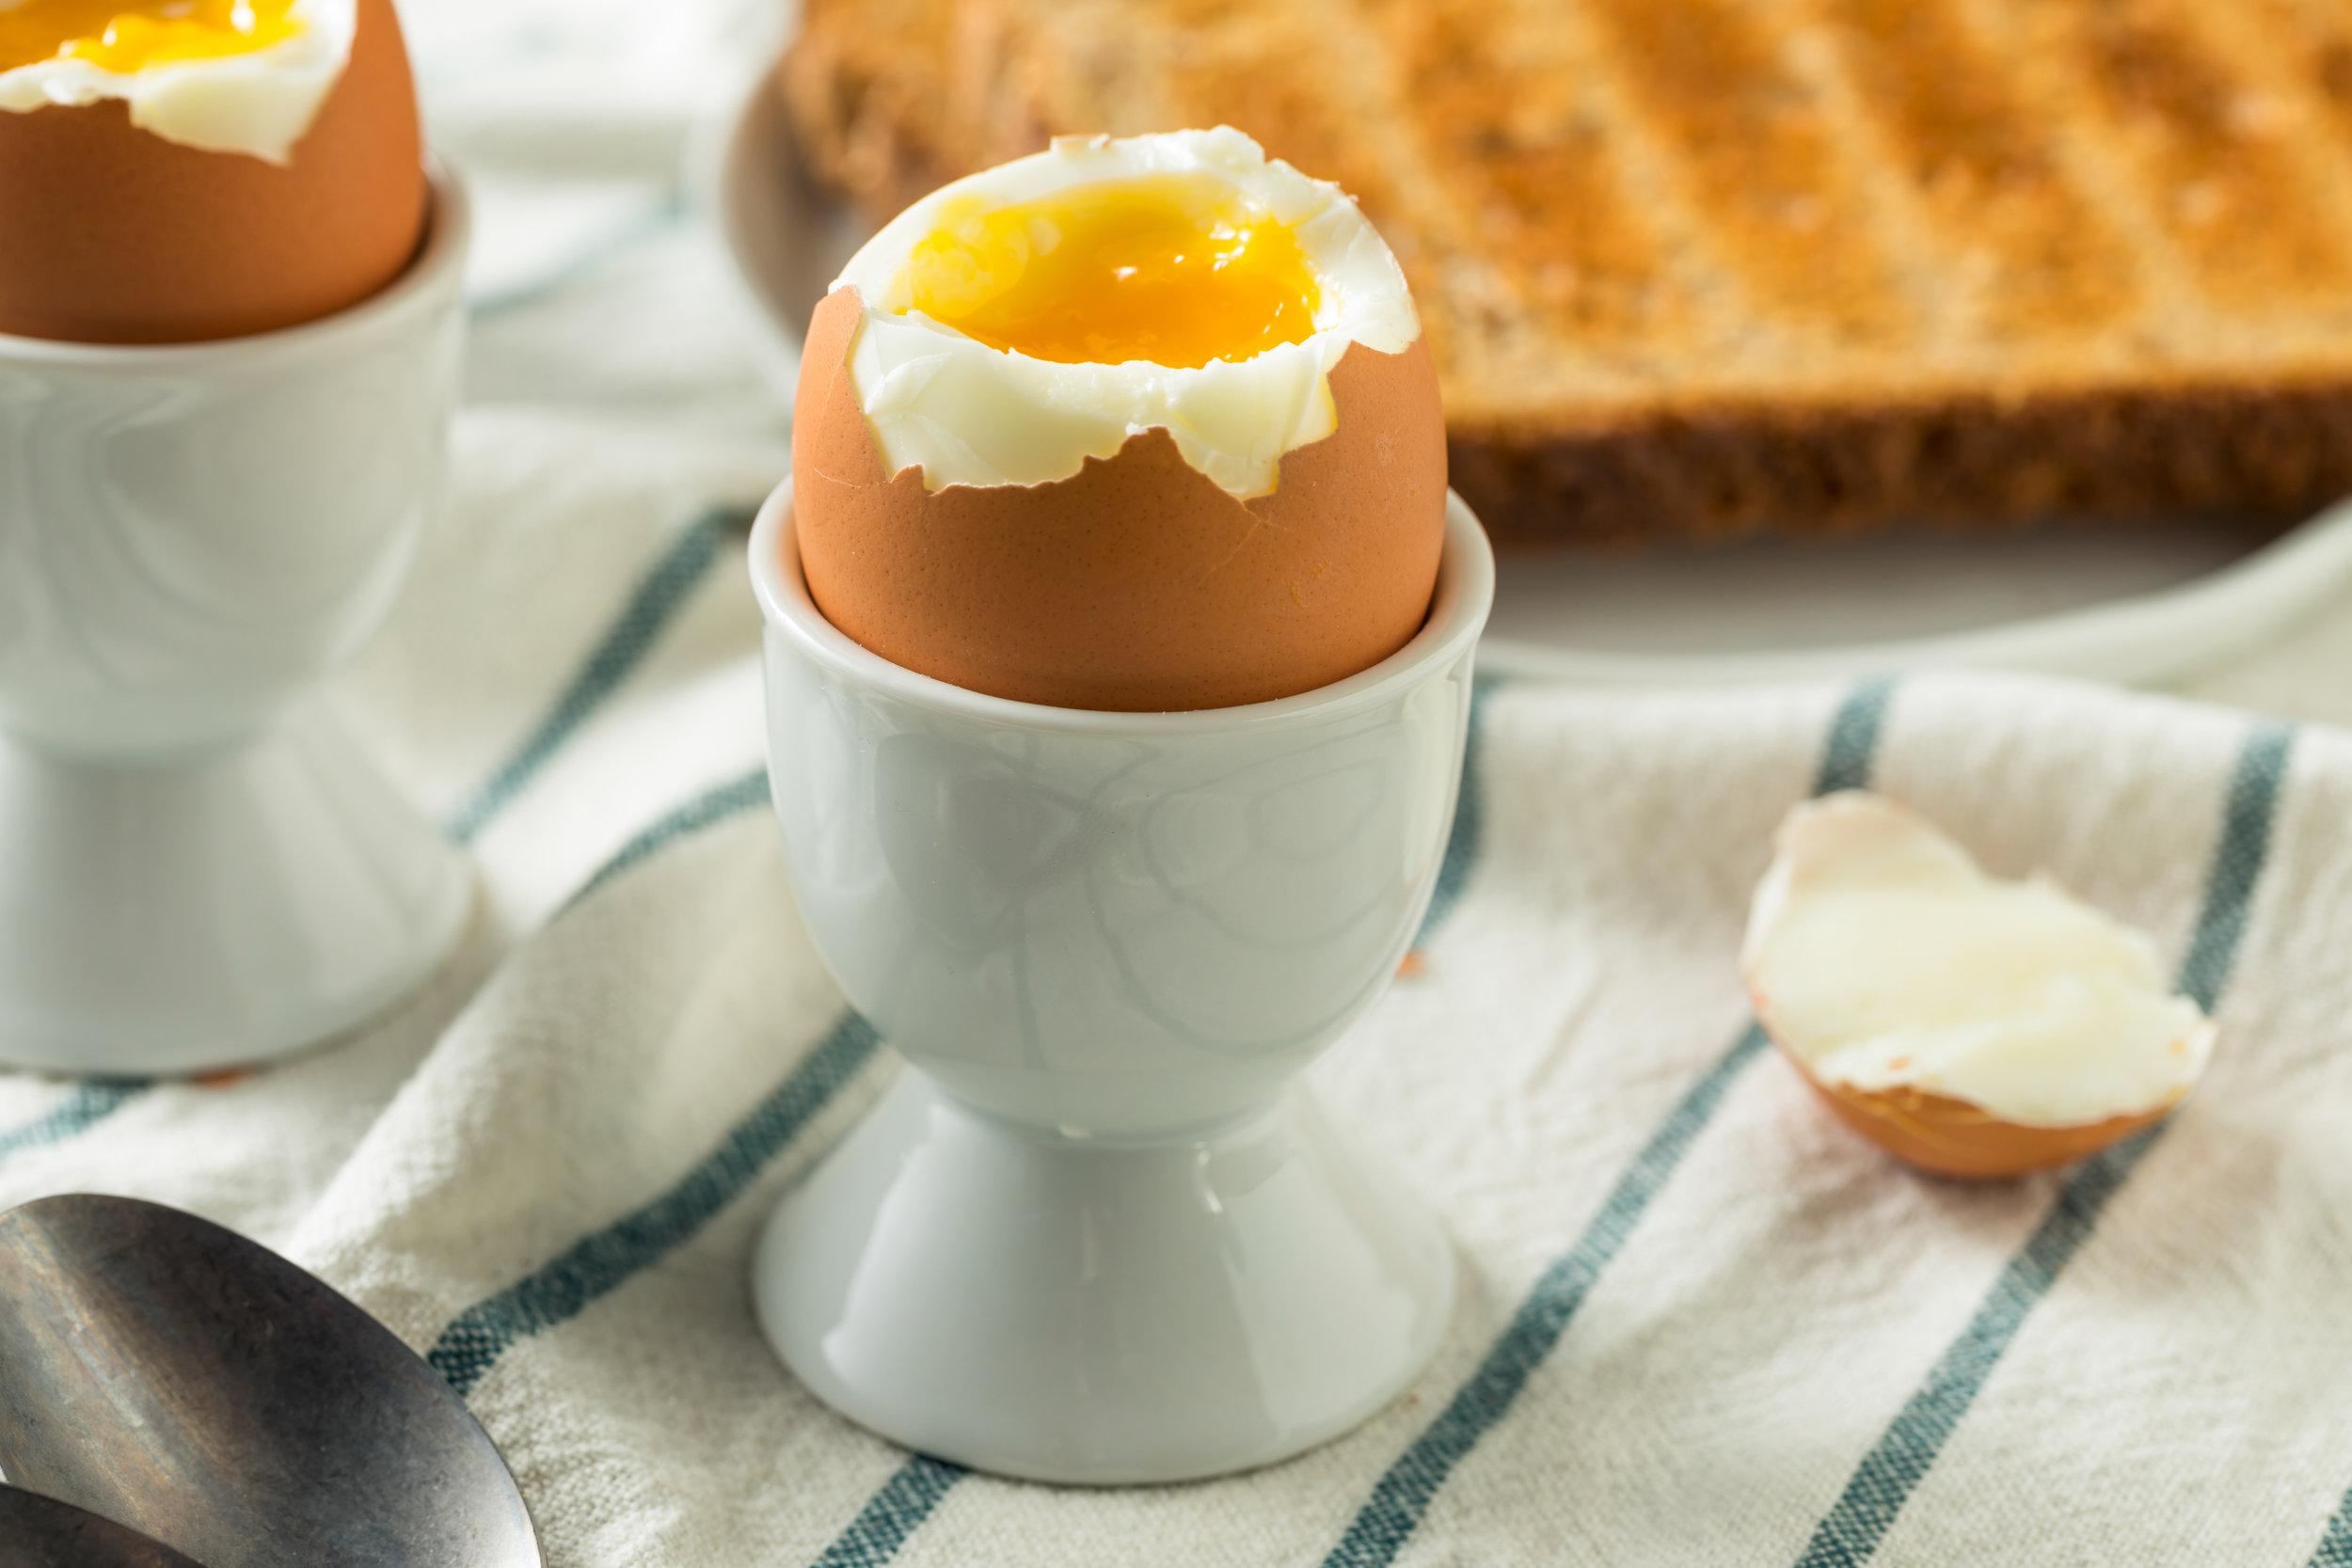 homemade-soft-boiled-egg-in-a-cup-PLWNXSJ.jpg